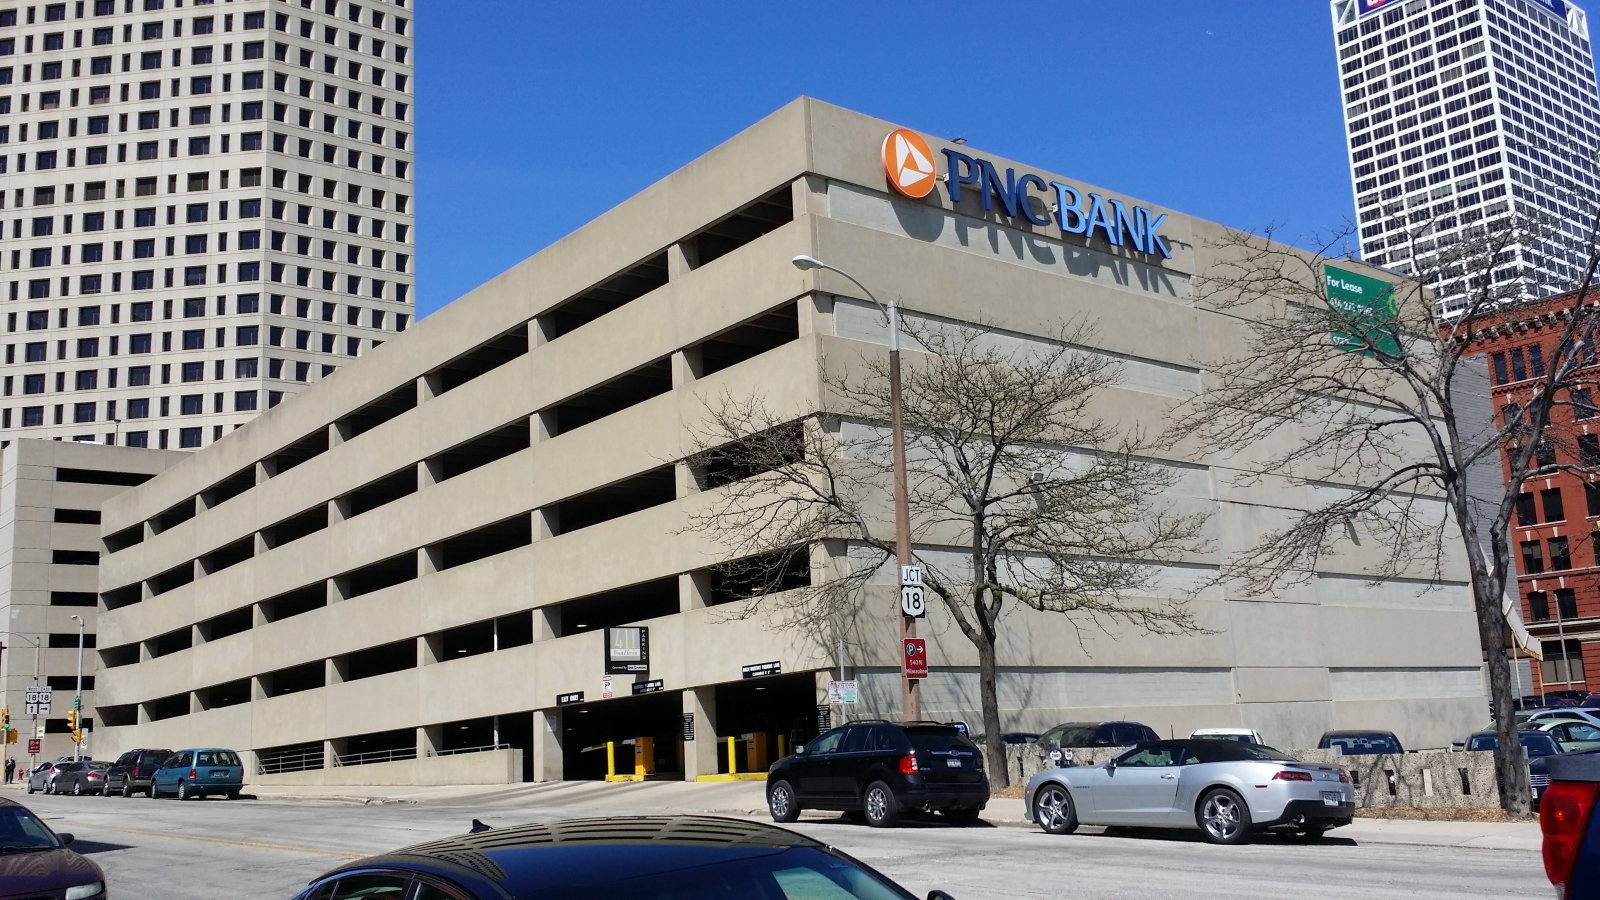 411 Building parking garage